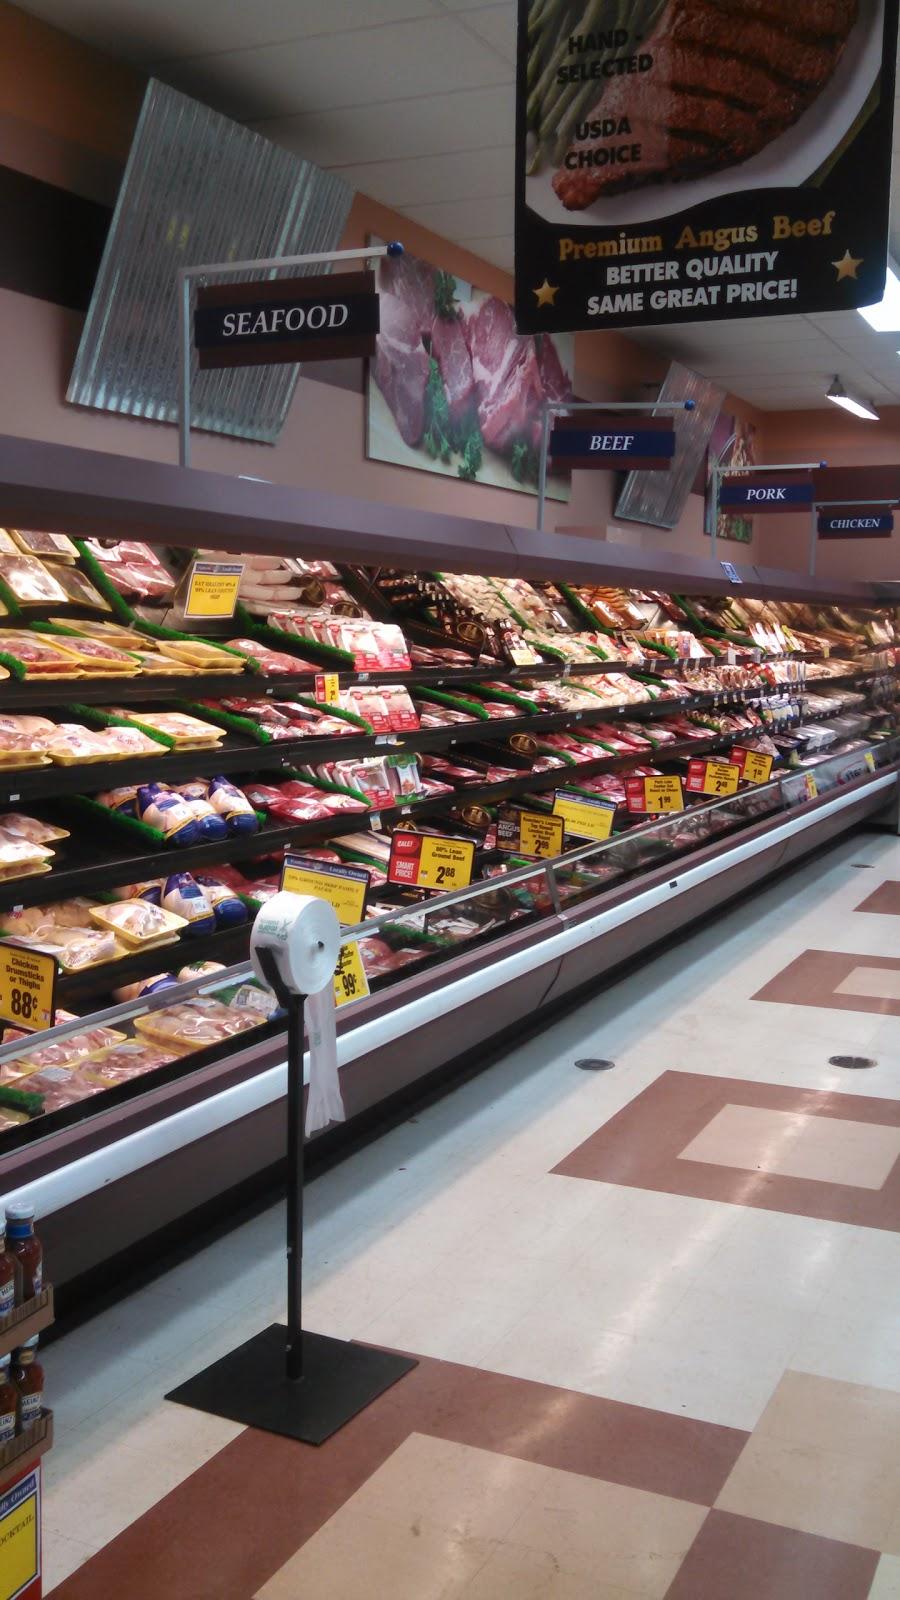 Foodtown of Shickshinny - florist  | Photo 5 of 9 | Address: 5 Mountain Mall, Shickshinny, PA 18655, USA | Phone: (570) 542-5522